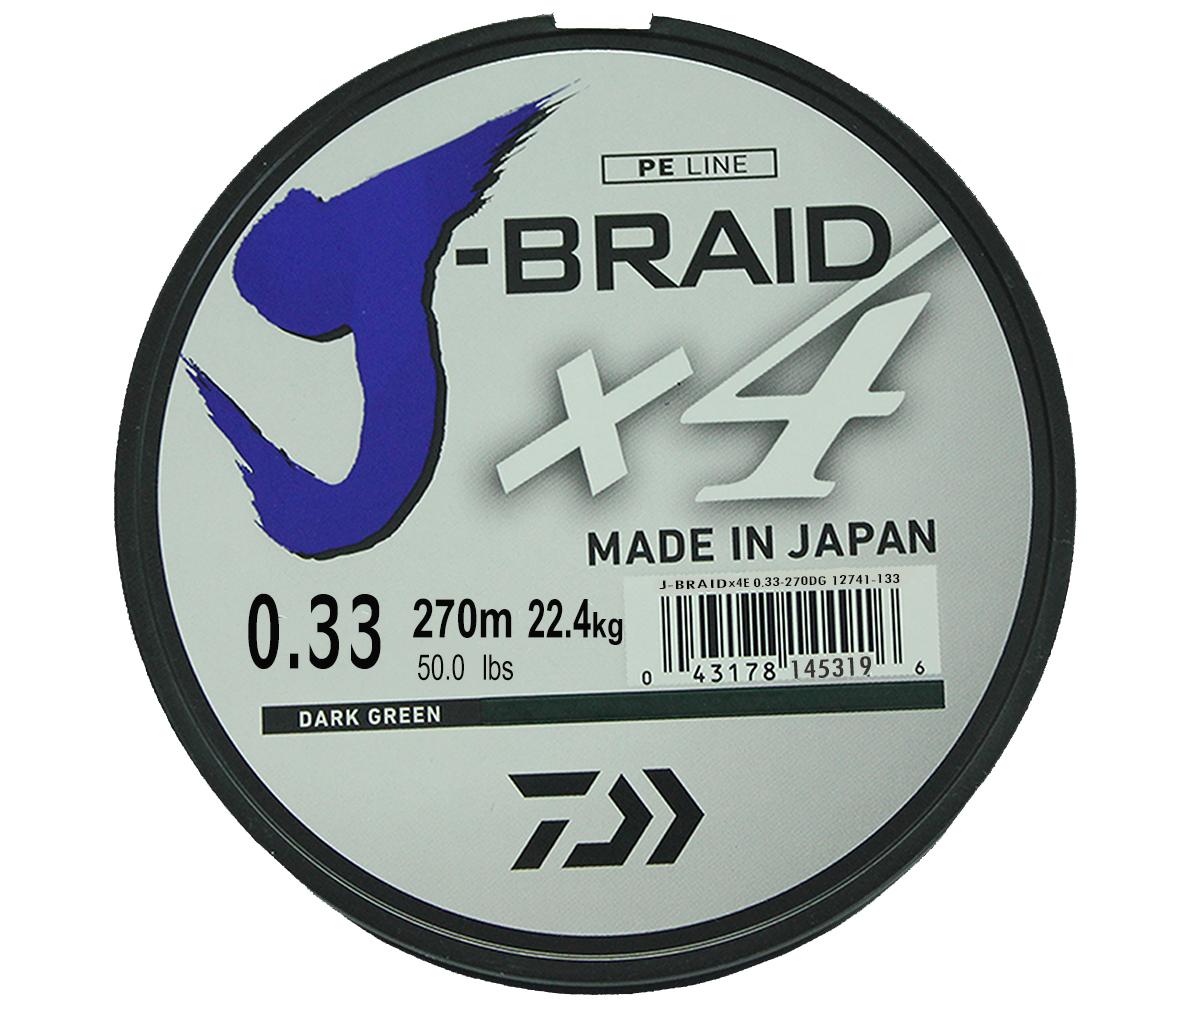 Шнур плетеный Daiwa J-Braid X4, цвет: зеленый, 270 м, 0,33 мм daiwa harrier x match 2553 x